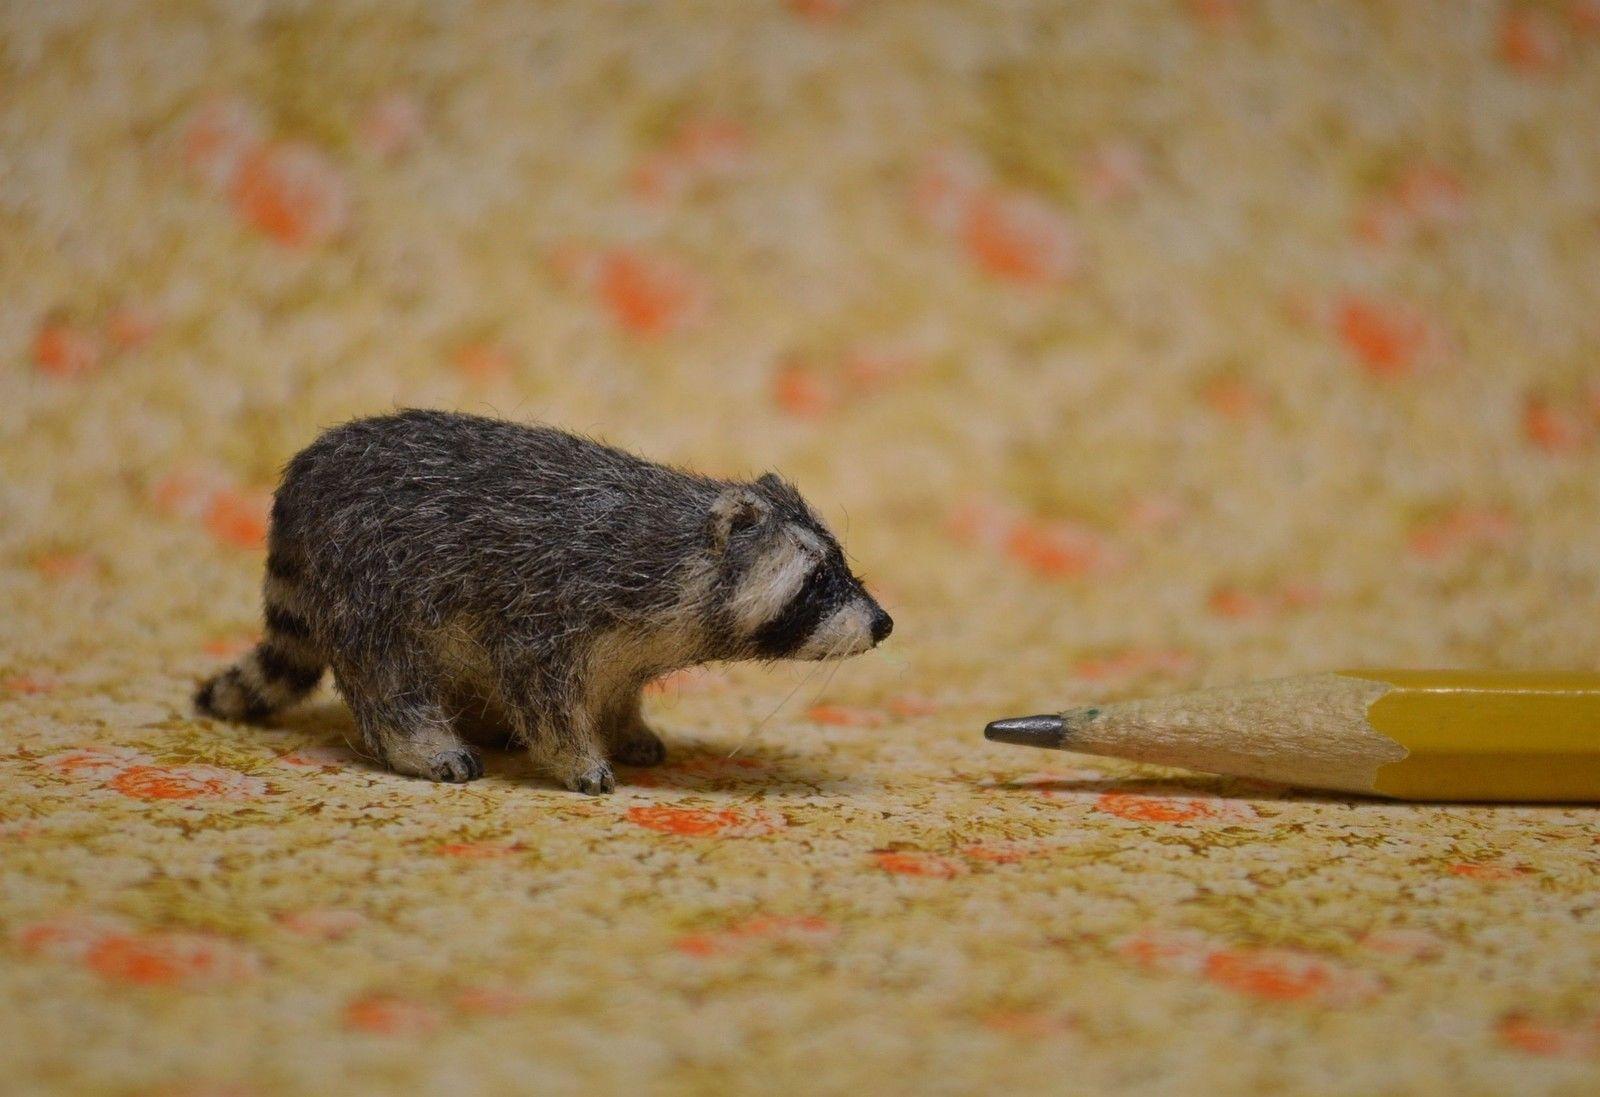 OOAK 1 12 Dollhouse Miniature Raccoon Wildlife Nature IGMA Fellow Linda Master | eBay